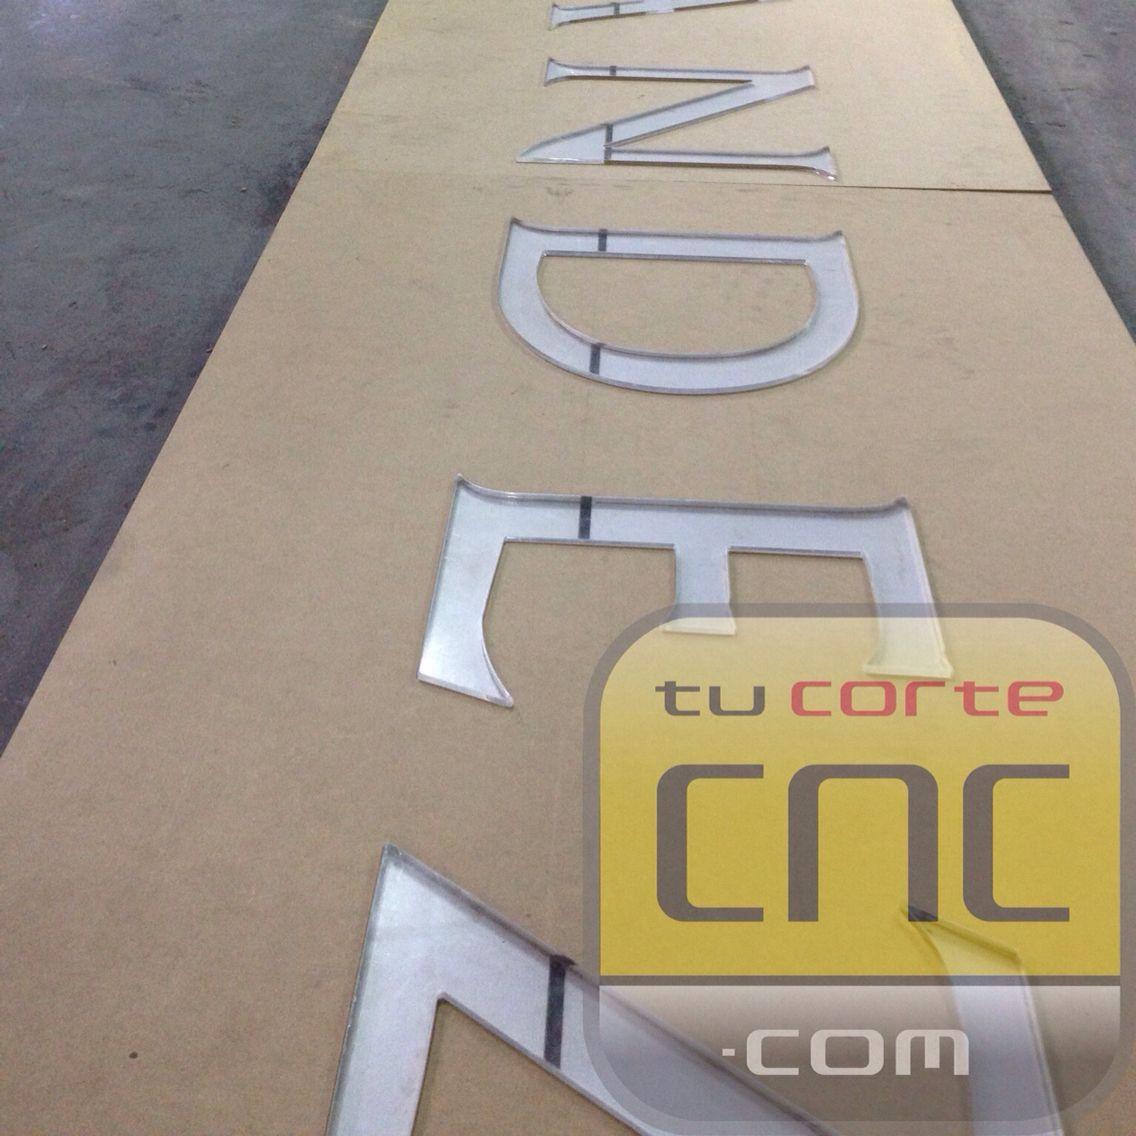 #cnc #acrilico #mdf #tucortecnc